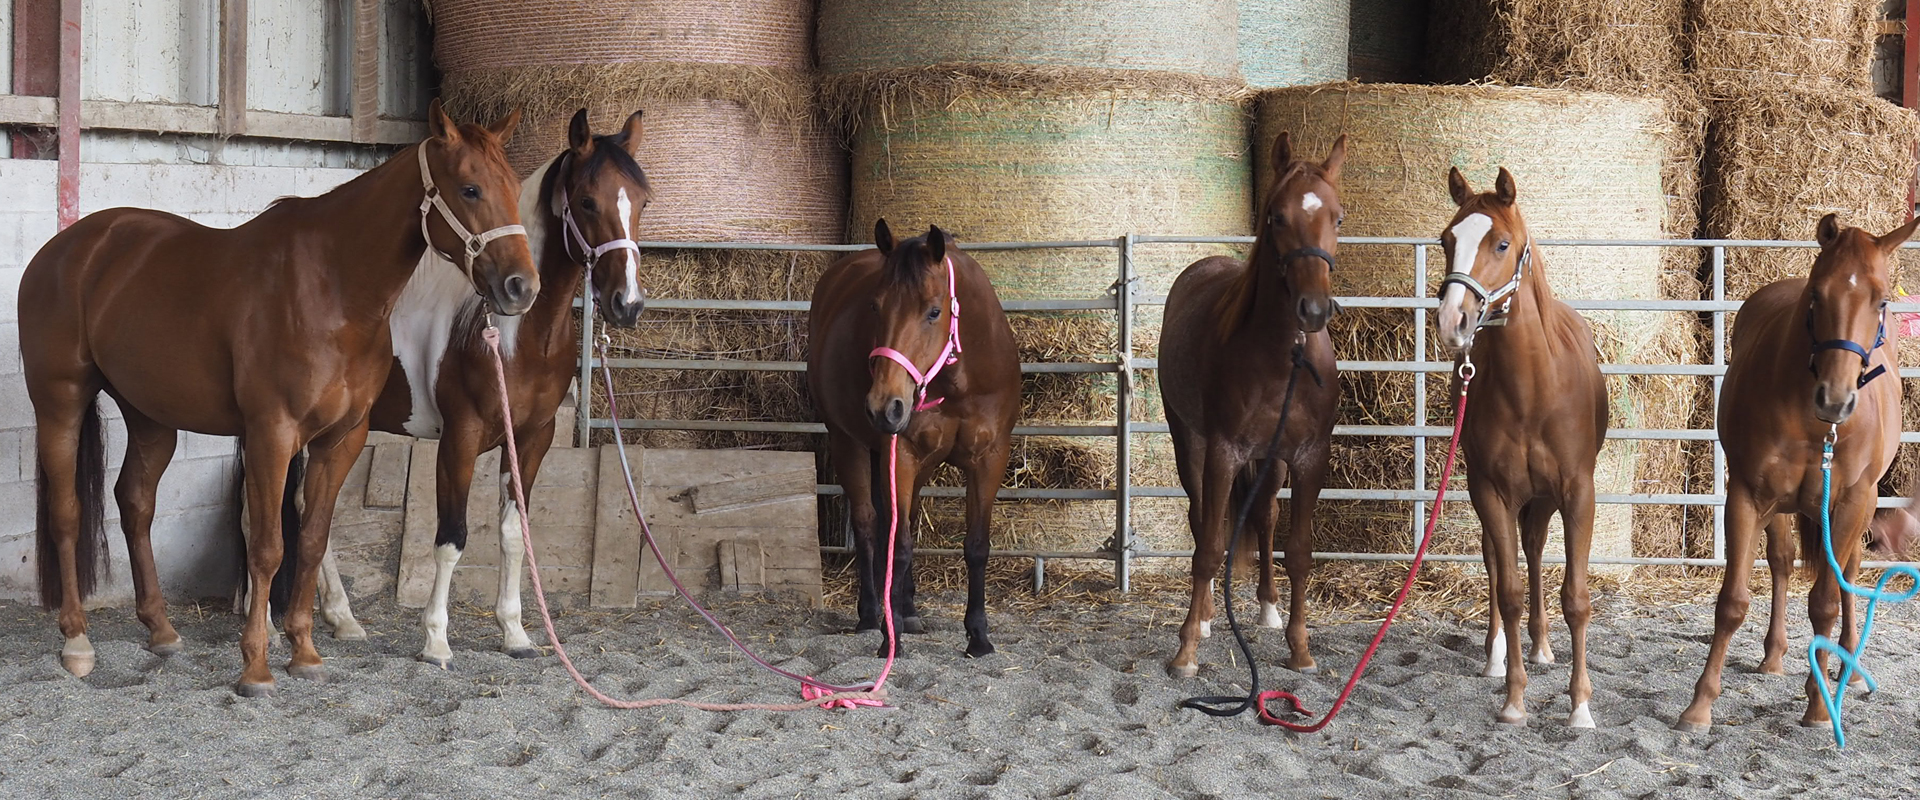 western-reiten-jura-pferdezucht-bea-asper